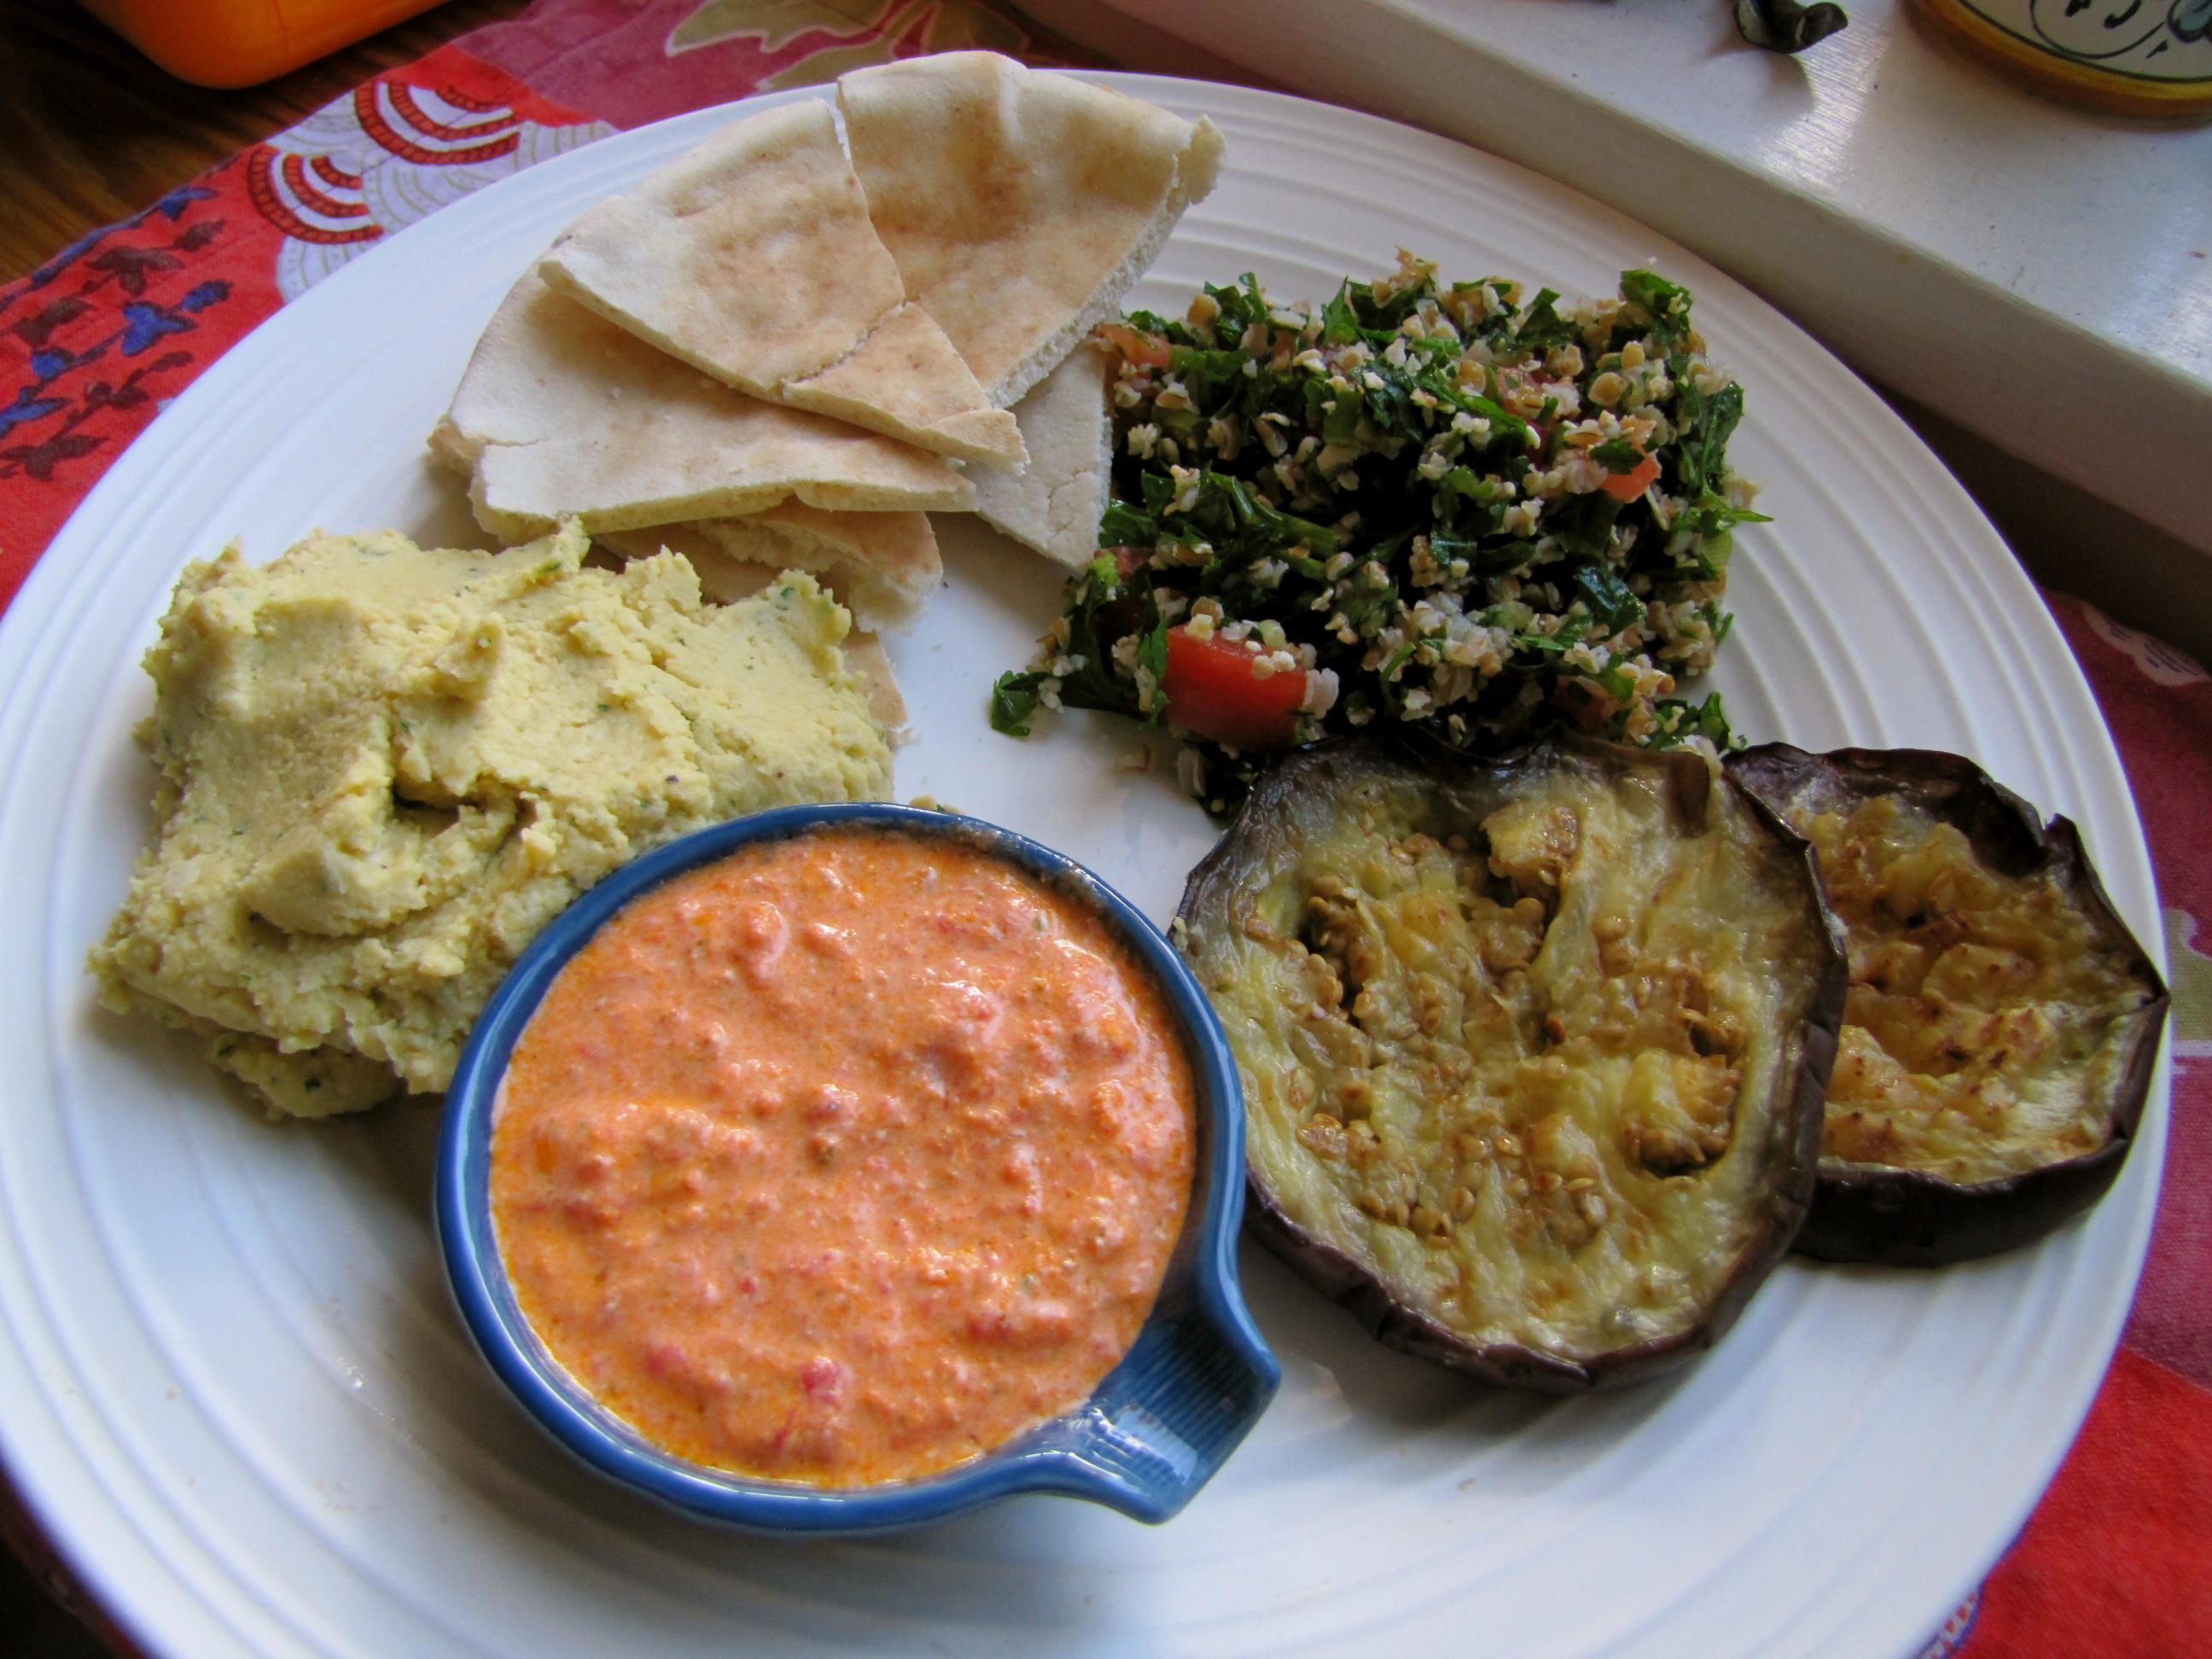 Mediterranean Plate: Hummus, Tabbouleh, Kopanisti, Grilled Eggplant